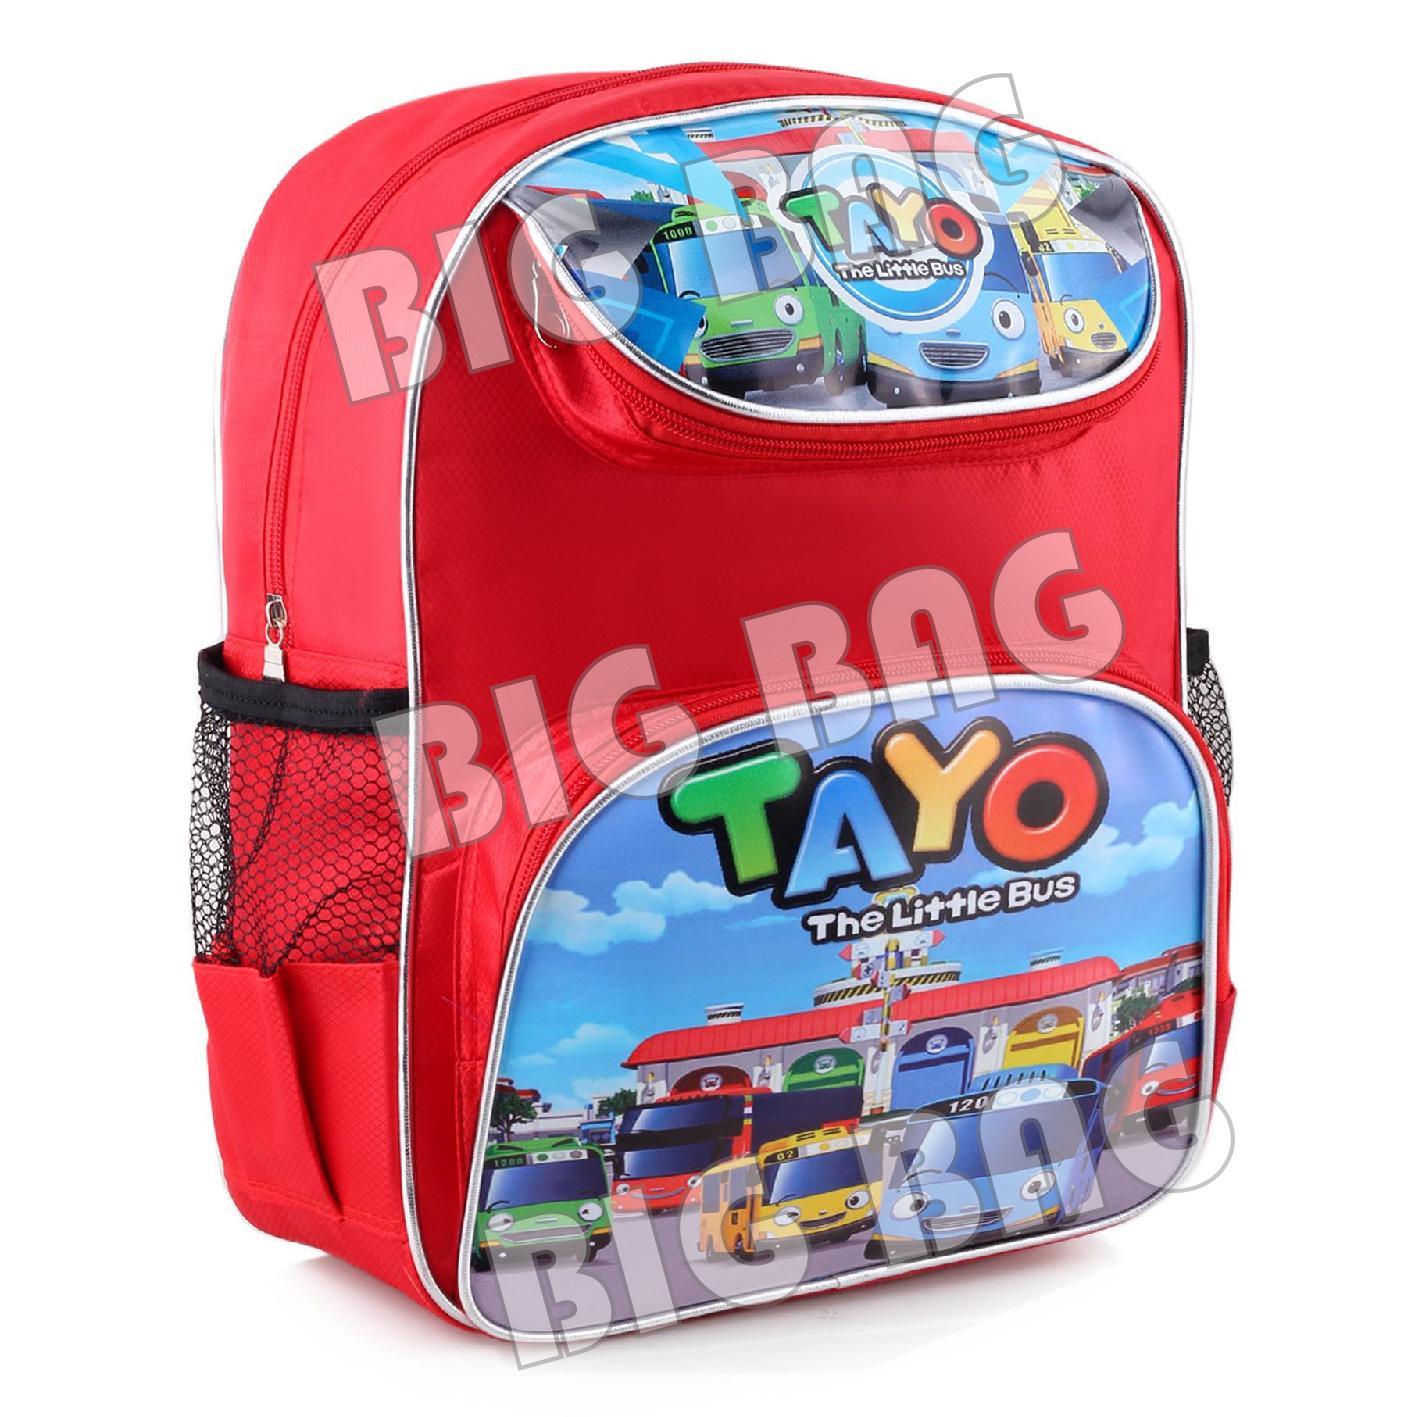 ... Tas Ransel Anak Laki Laki Karakter - Tayo - Let s Go + FREE Lunchbox -  School ... 056d13e1f9